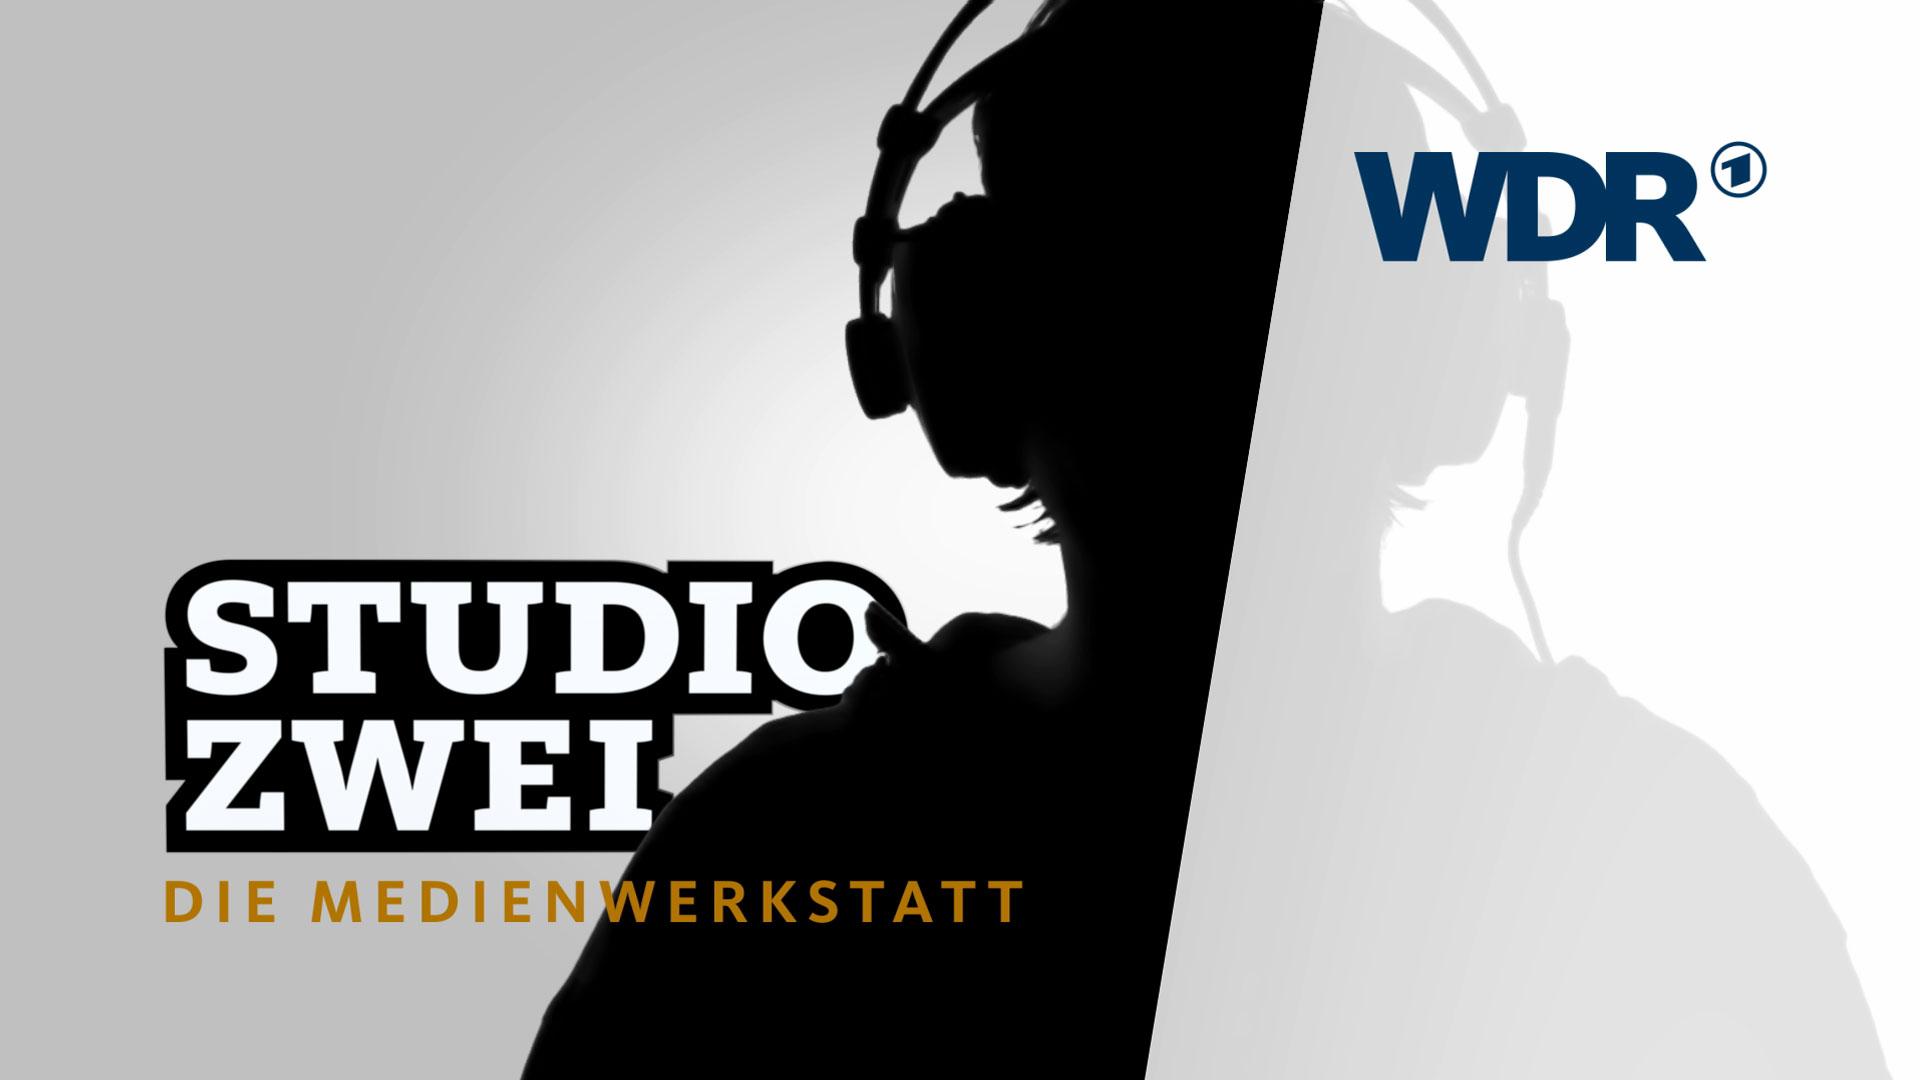 Binar I Motion Design I WDR Studio Zwei